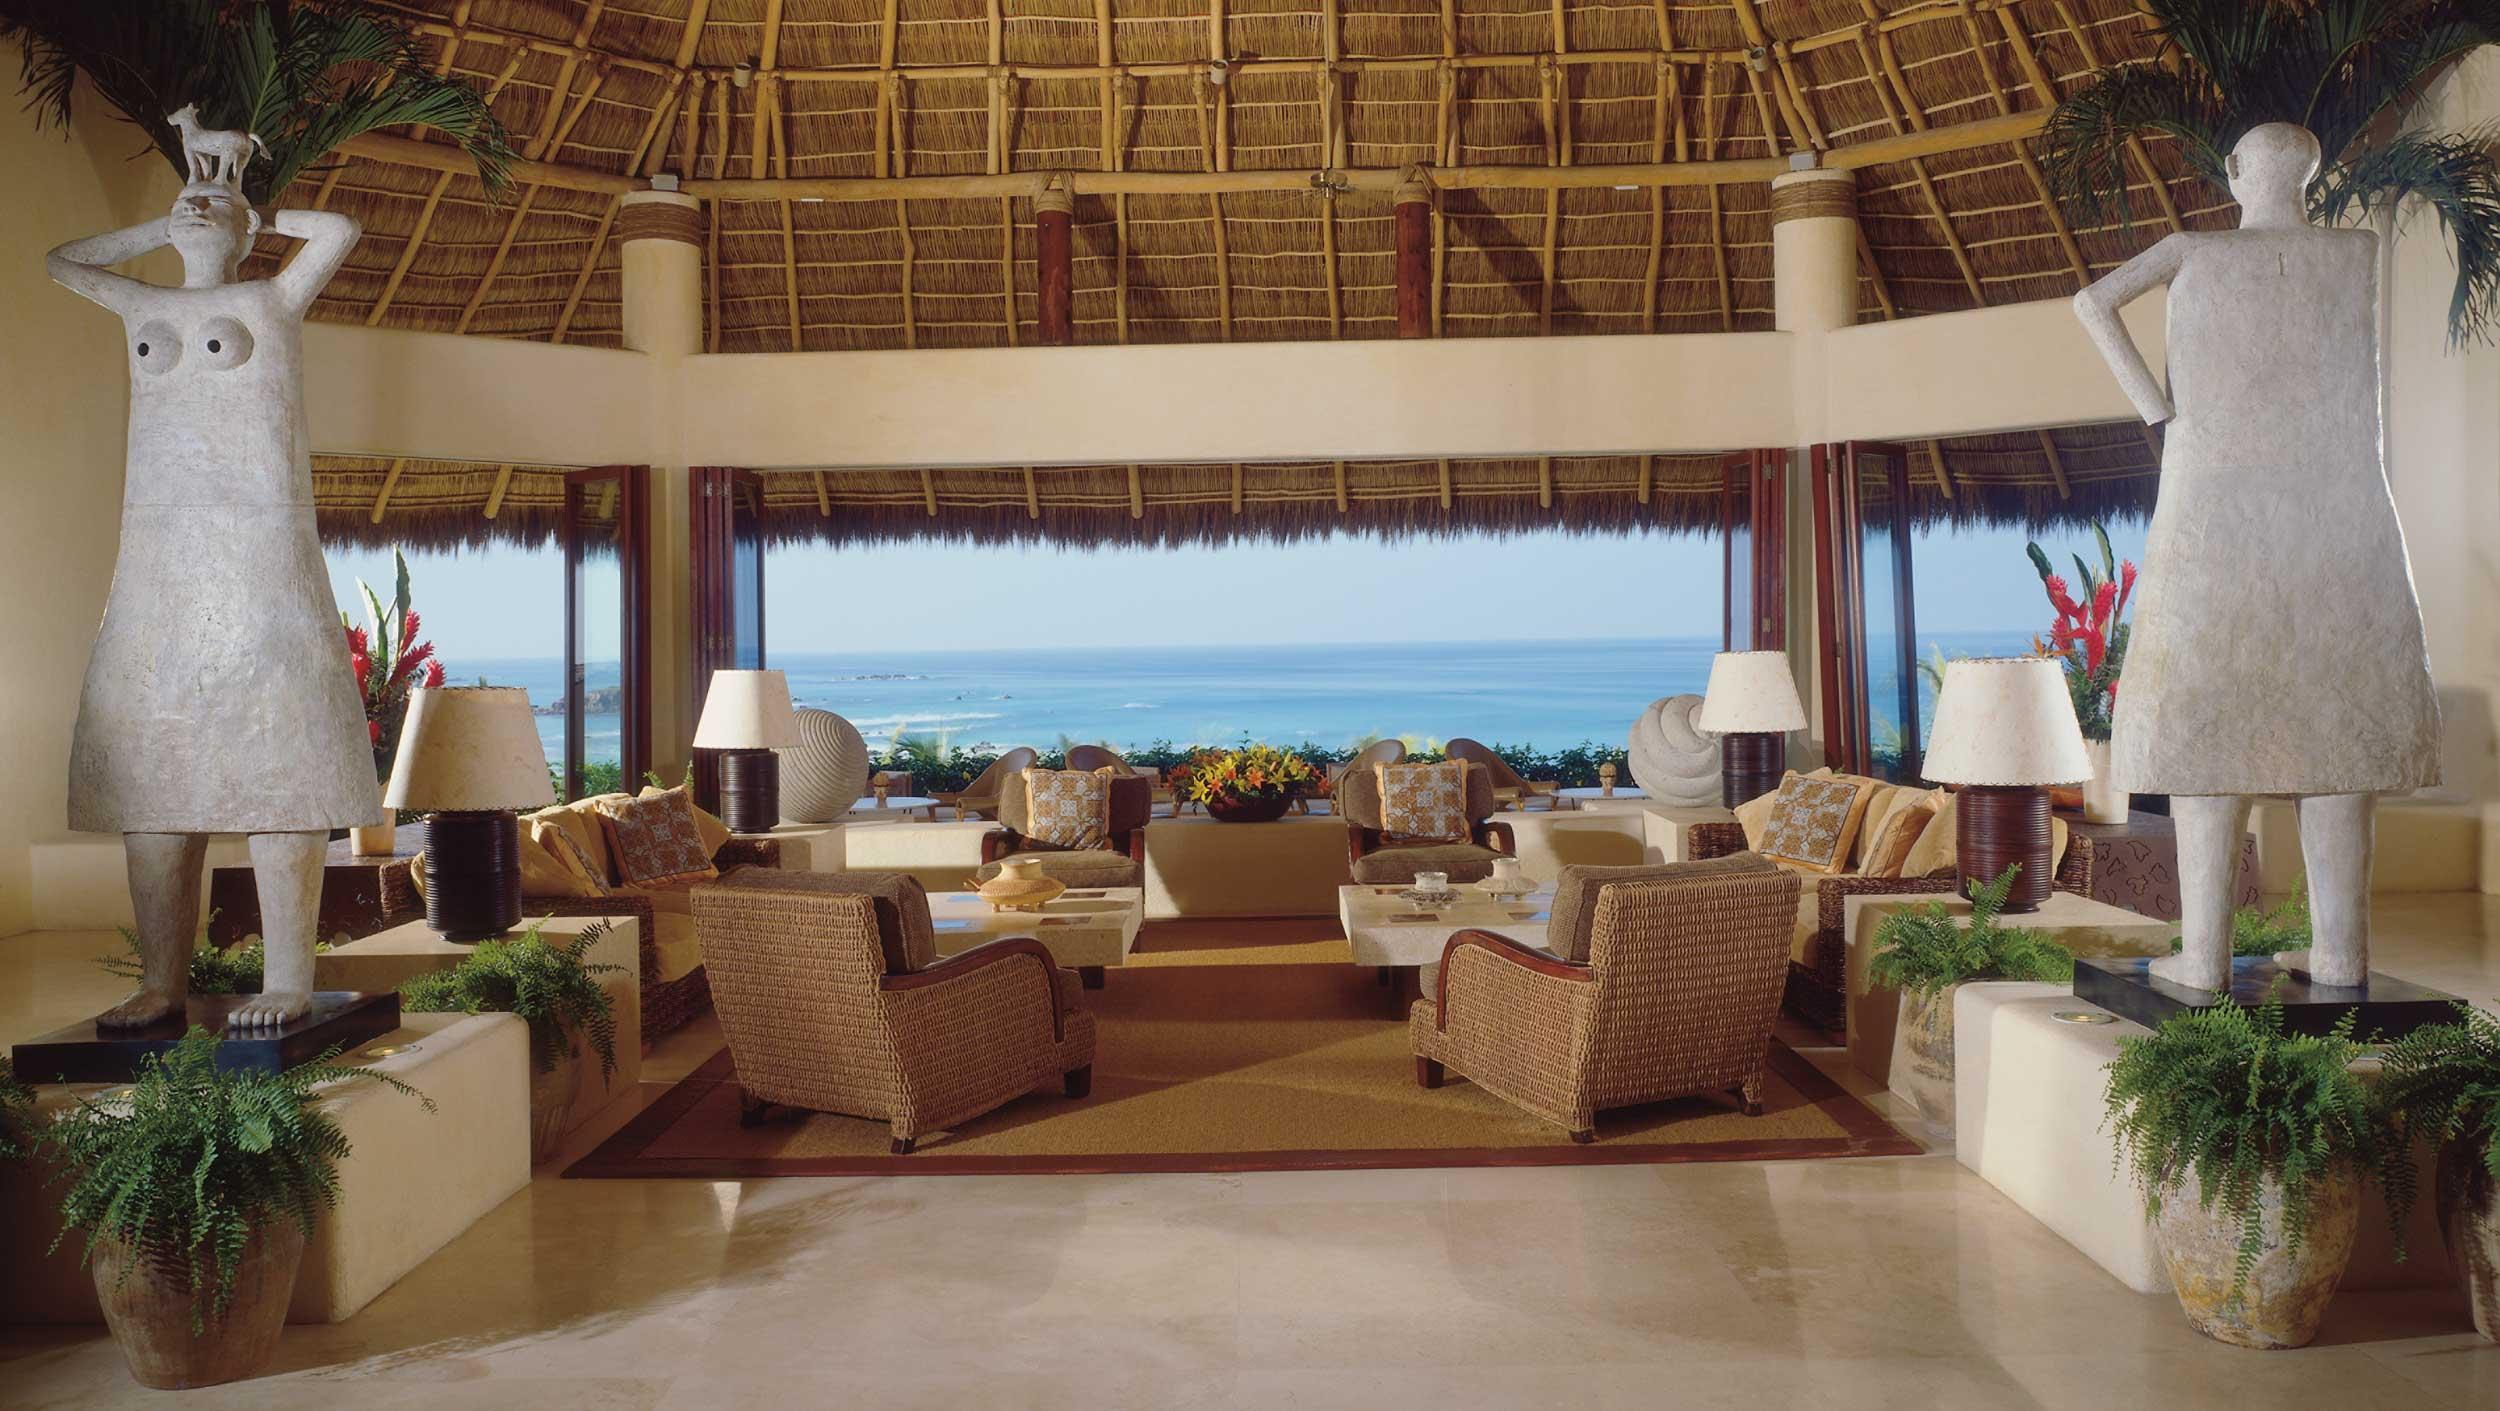 Here's Why Four Seasons Punta Mita Might be Mexico's Premier Luxury Beach Resort